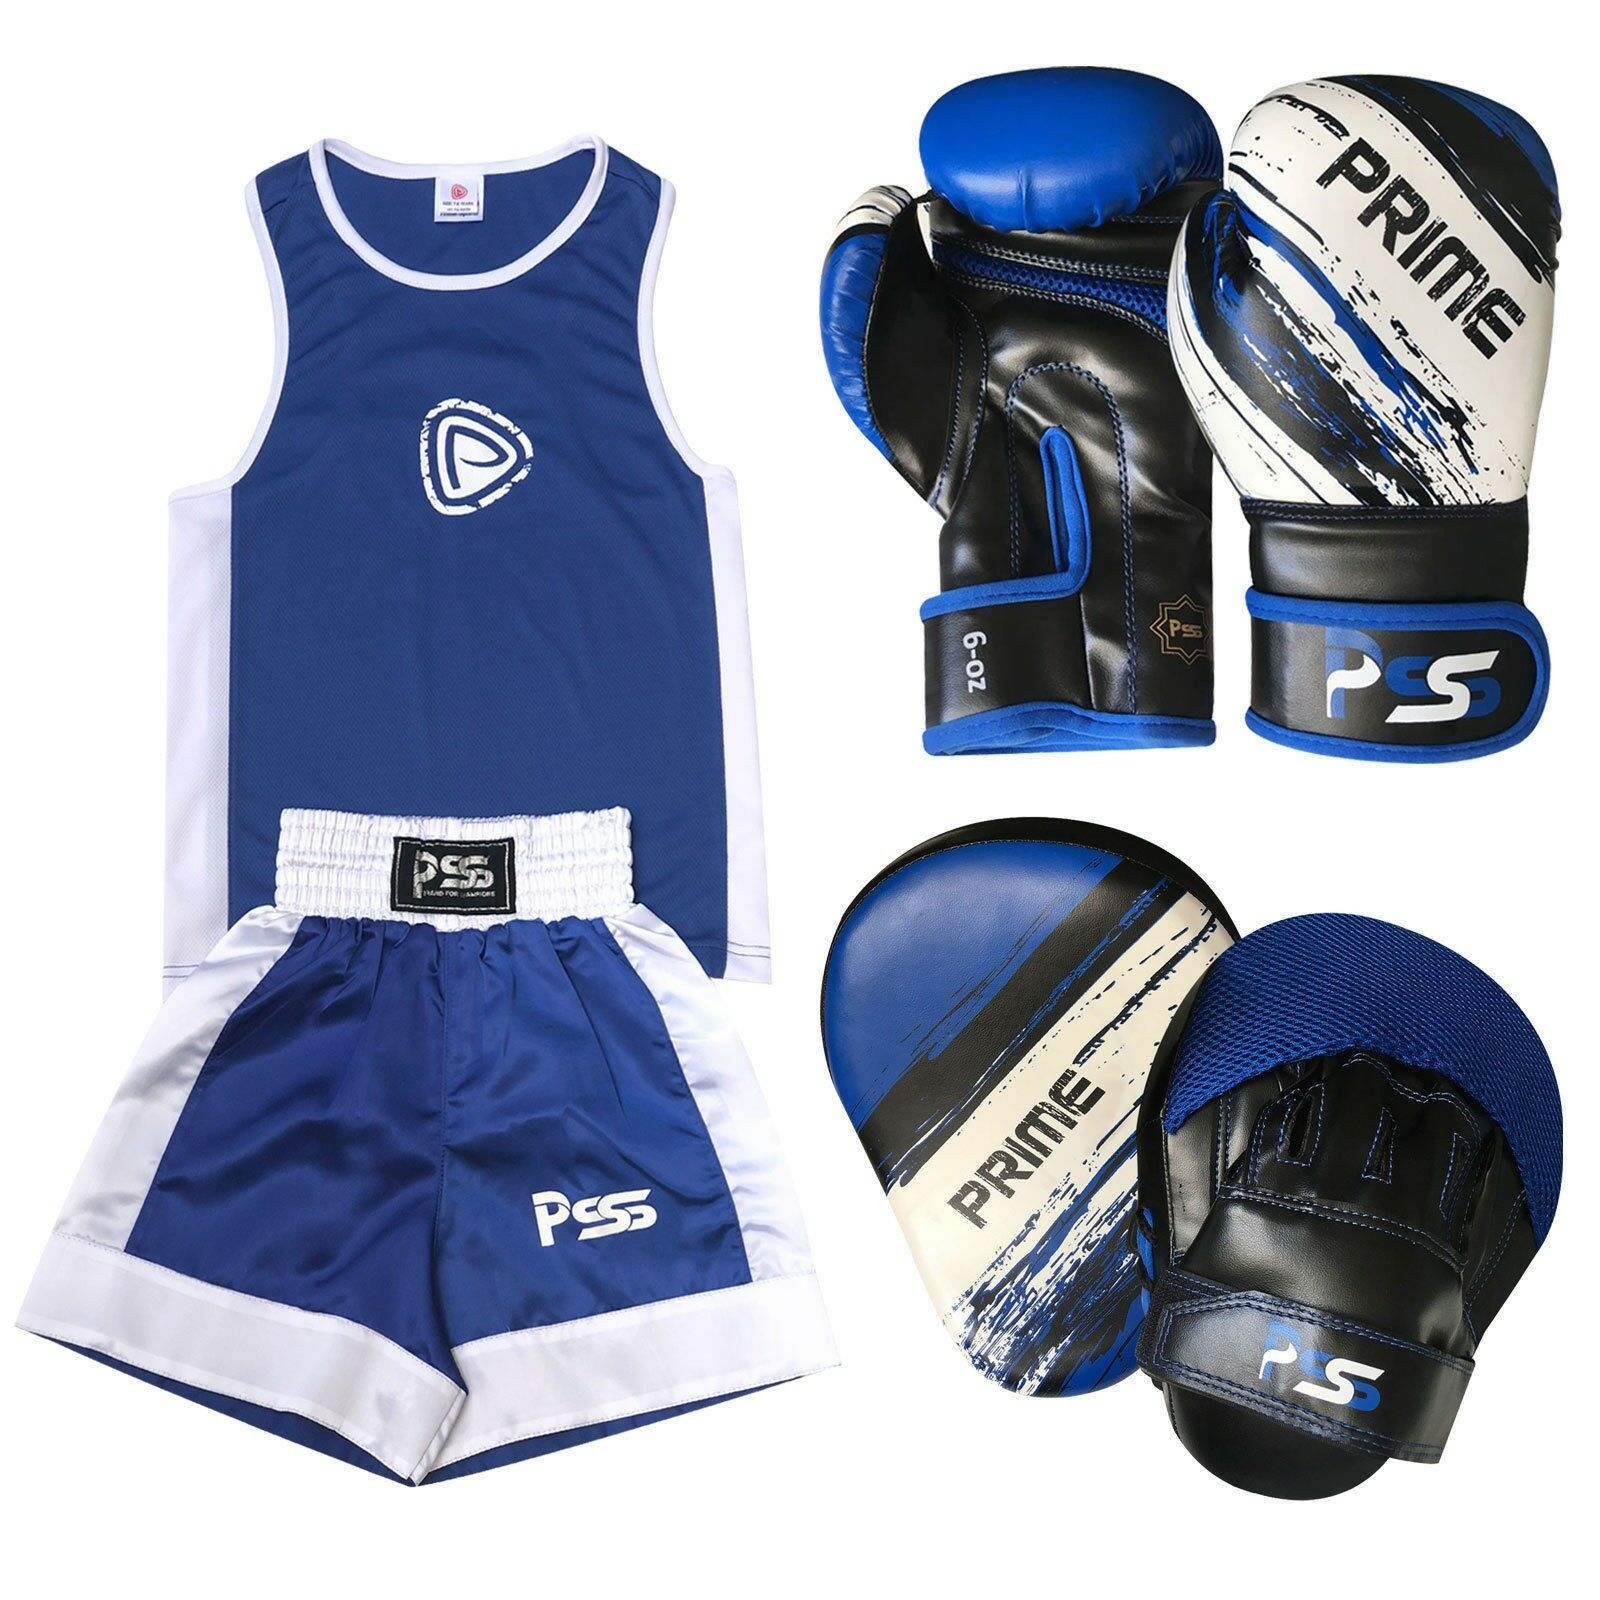 bluee Kids boxing SET 3 Pcs Uniform  + boxing G  1012 + Focus pad 1106 (SET-14)  hot sports